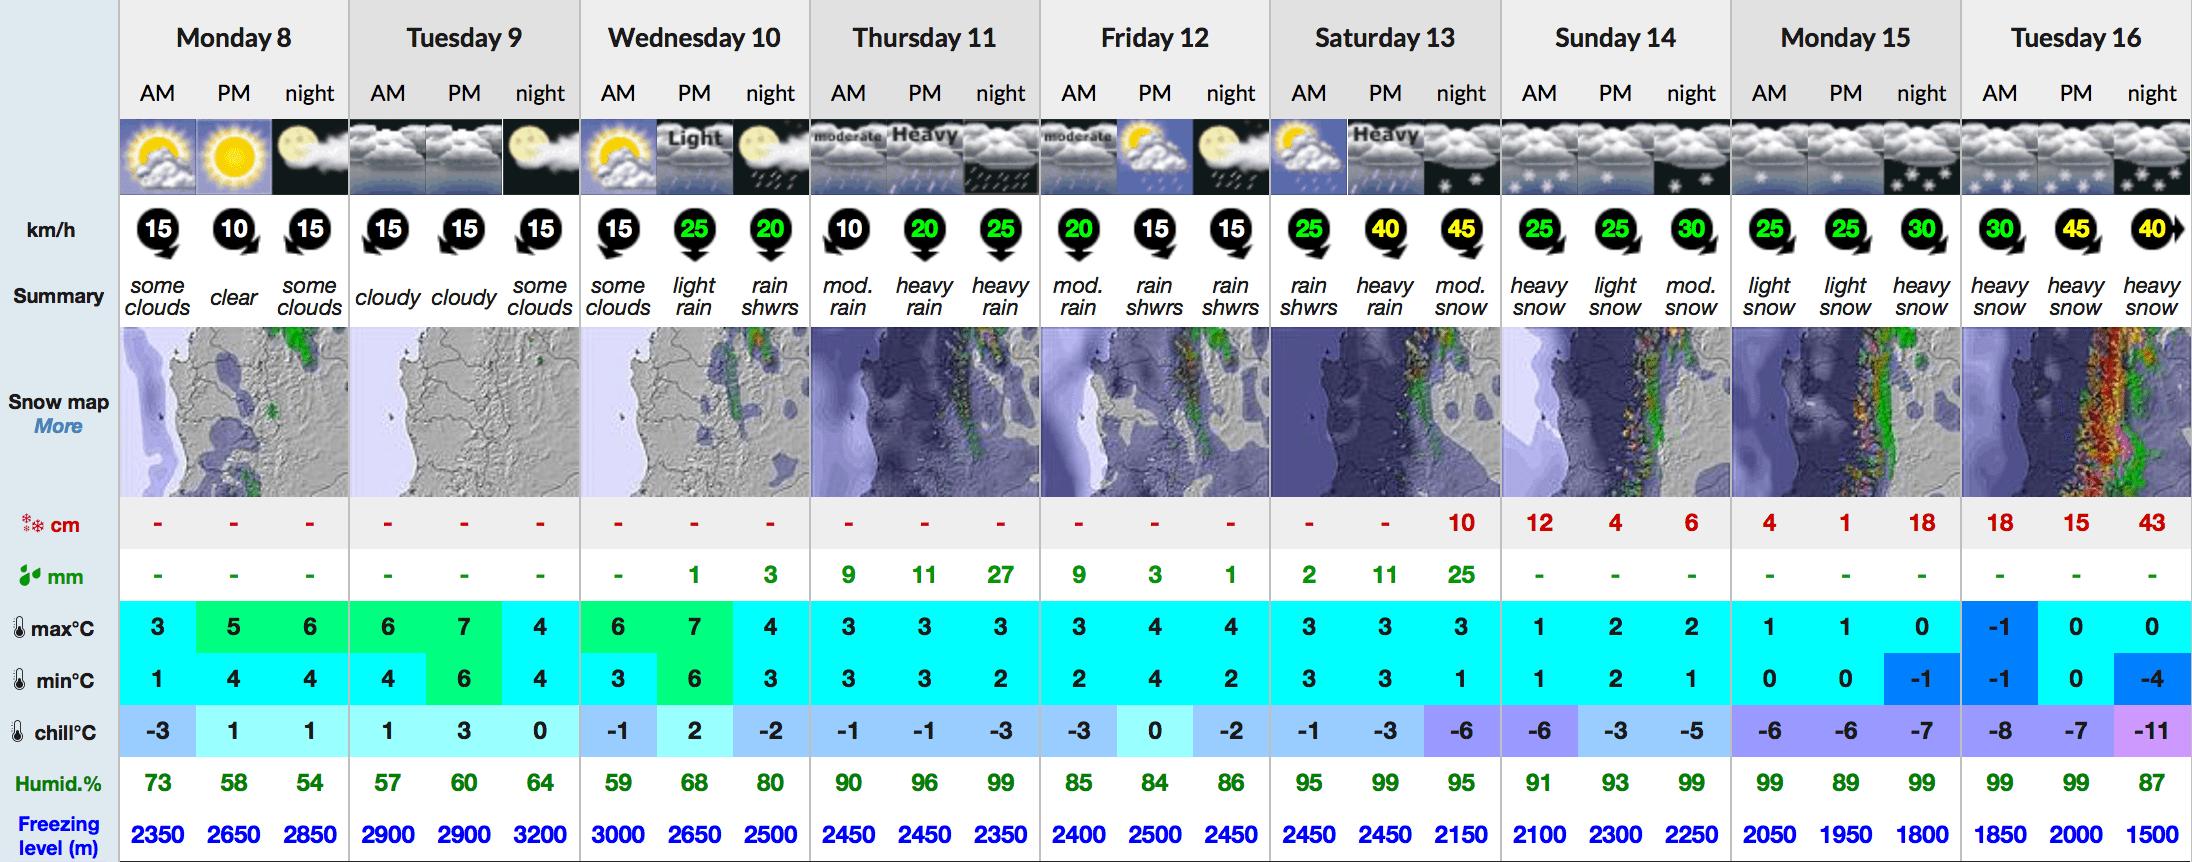 Snow-Forecast 9 day Nevados de Chillan mid 8-5-17-min